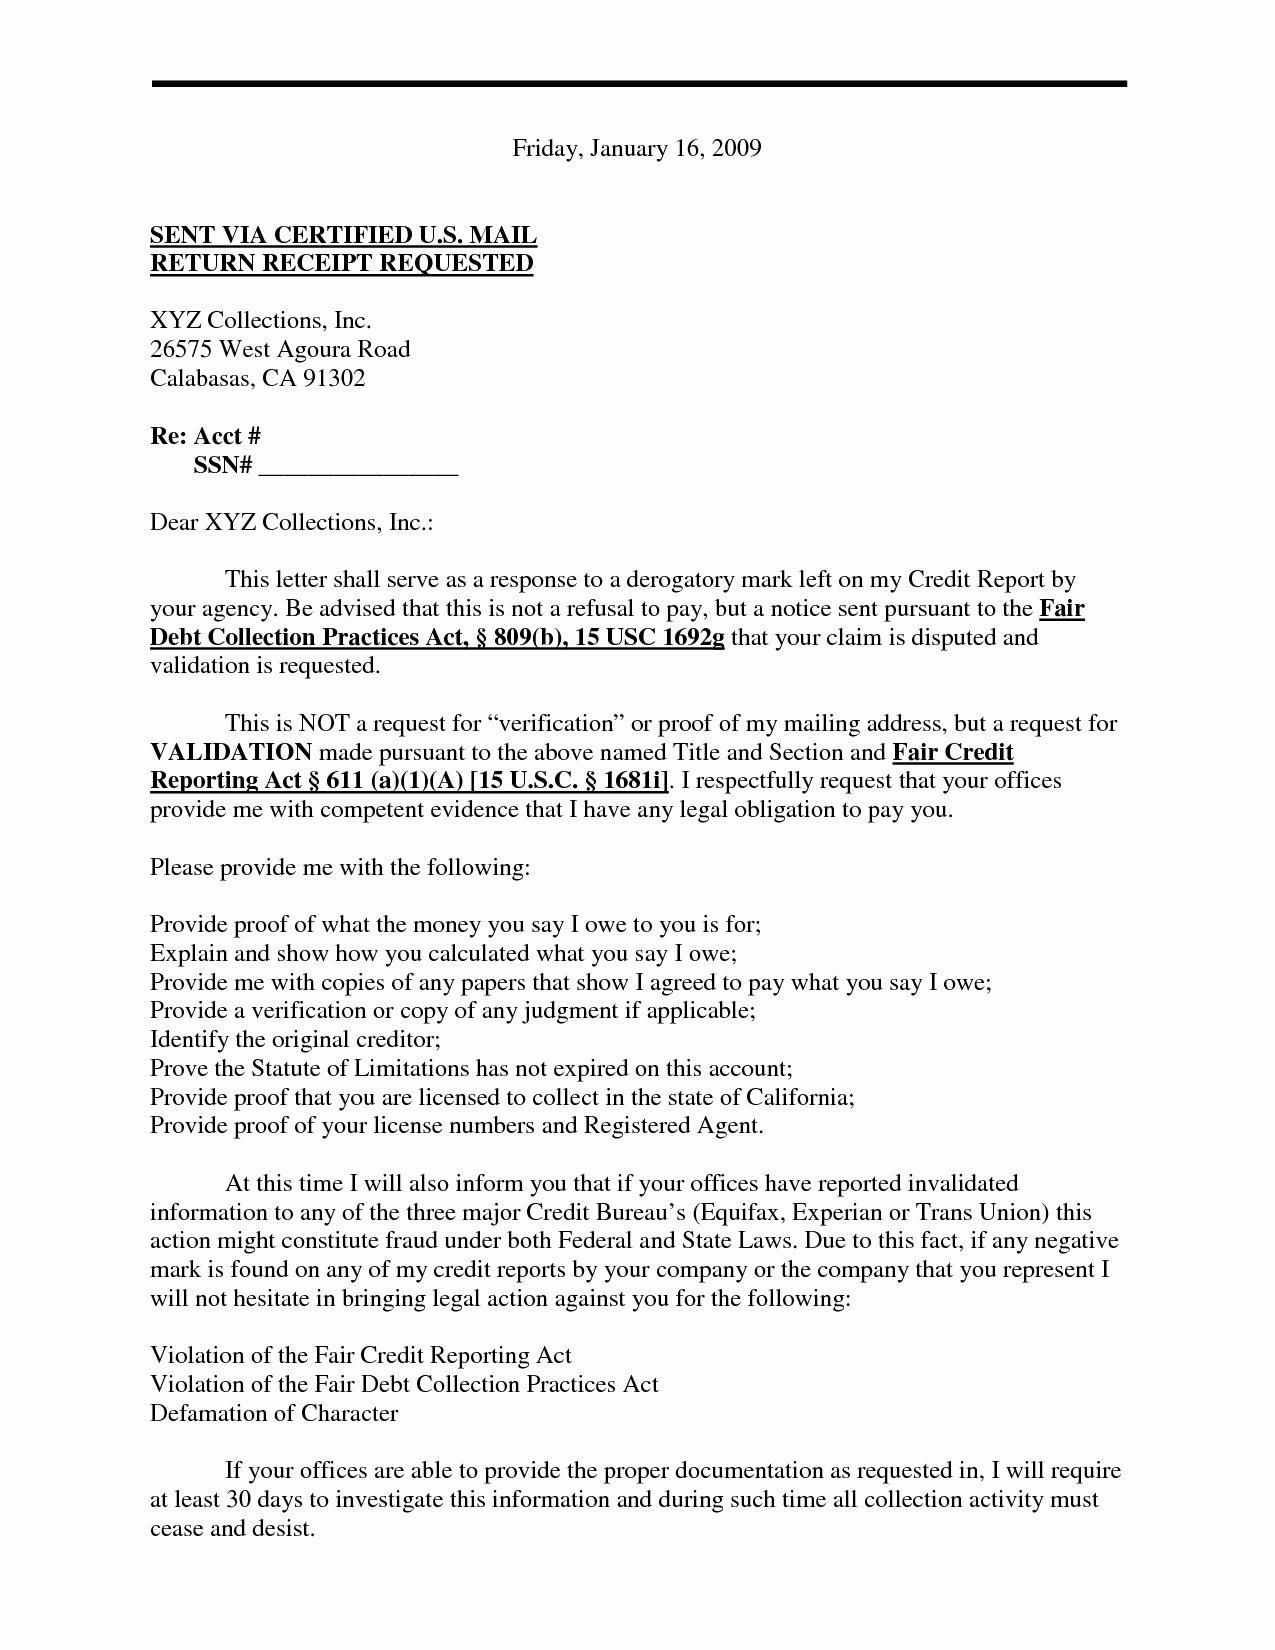 Validation Debt Letter